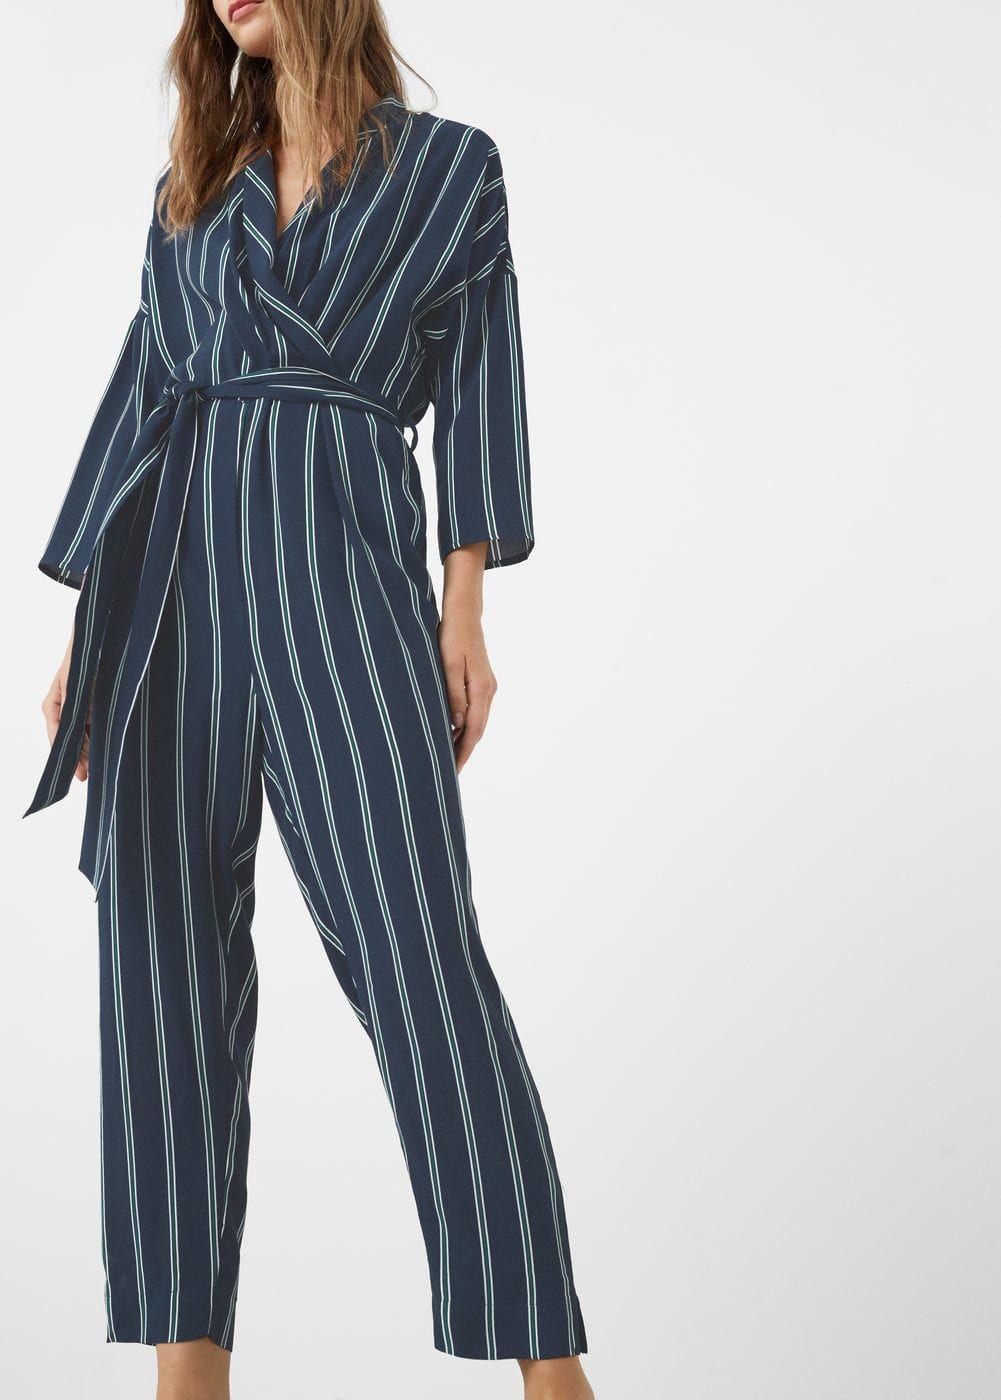 6e2432a4df9f Printed wrap jumpsuit - Women | casual clothes | Kvinnor, Trender